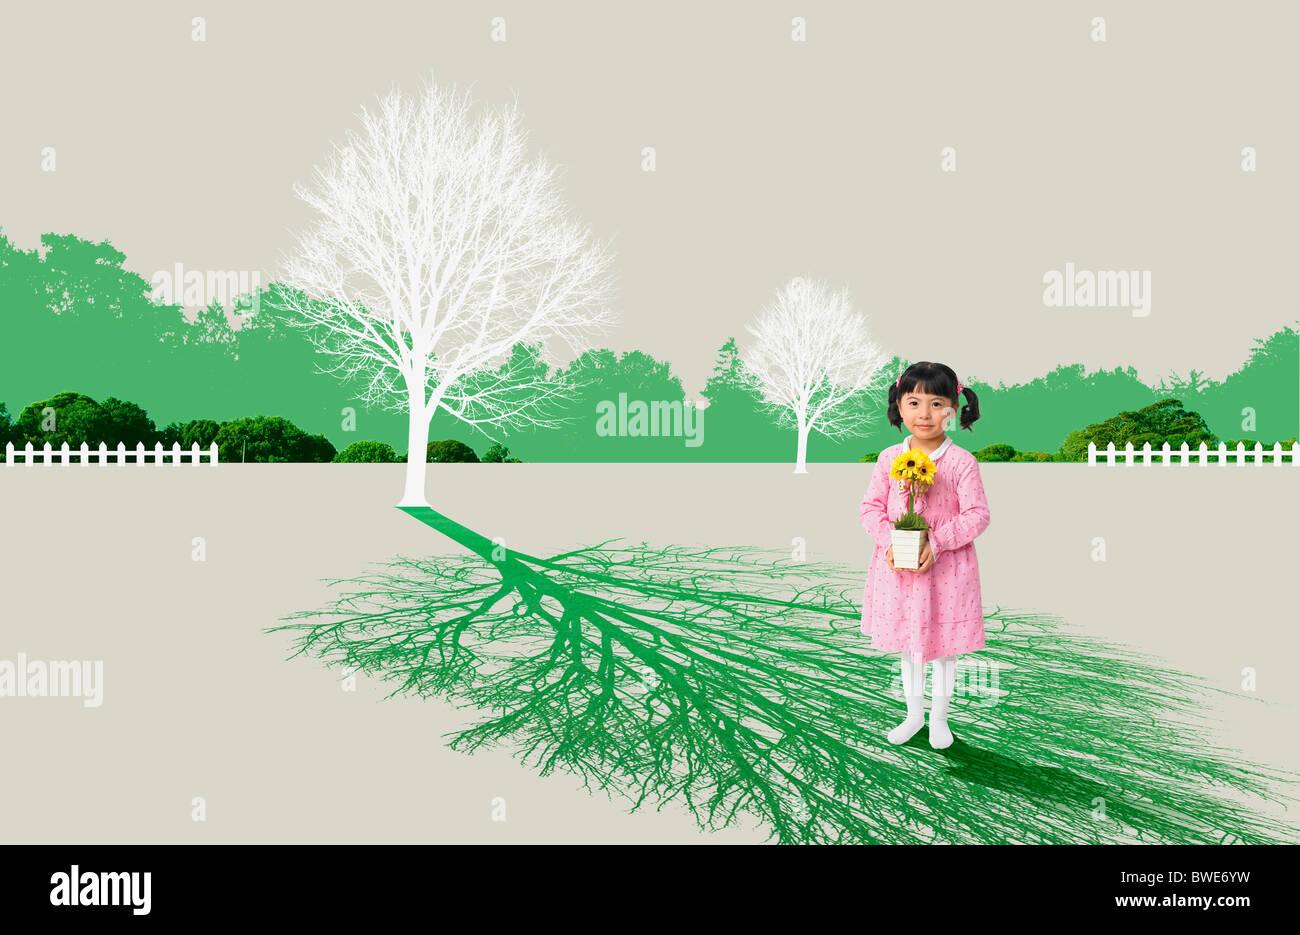 girl holds a flowerpot - Stock Image